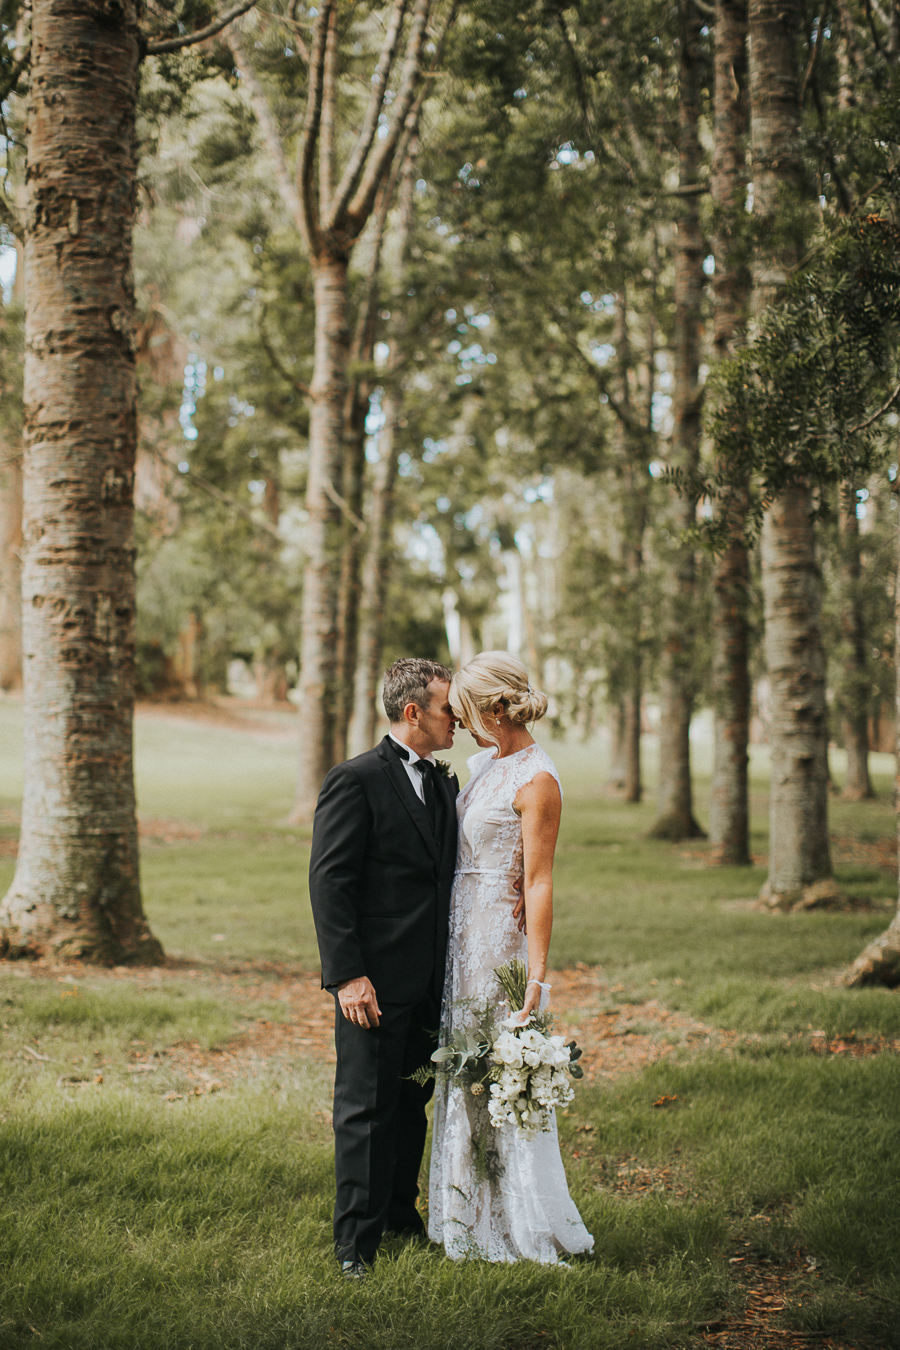 Auckland wedding photographer Victoria Mike107.JPG